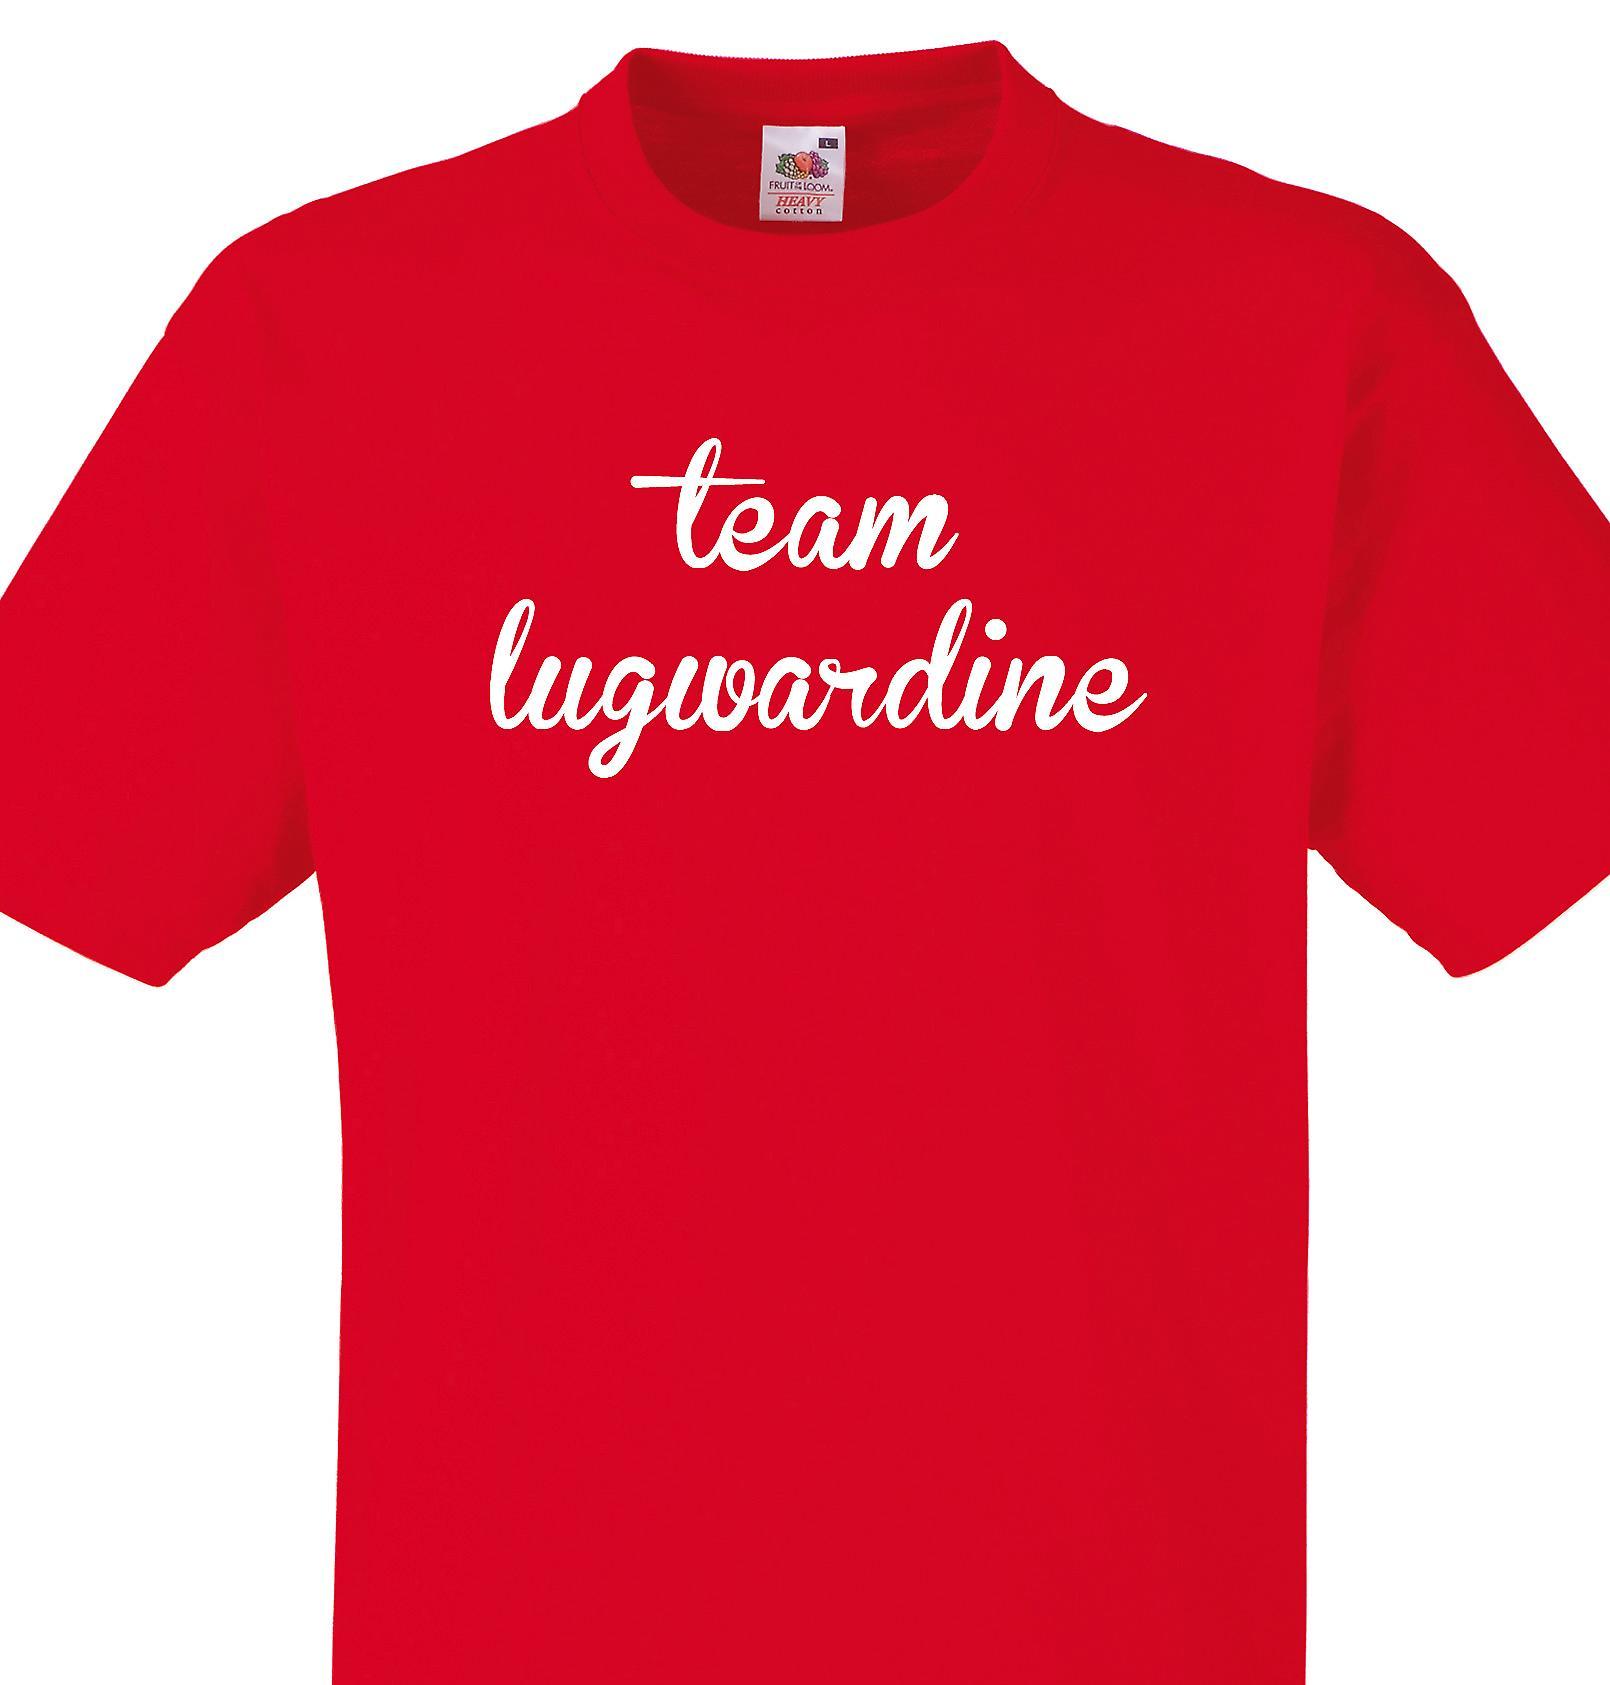 Team Lugwardine Red T shirt